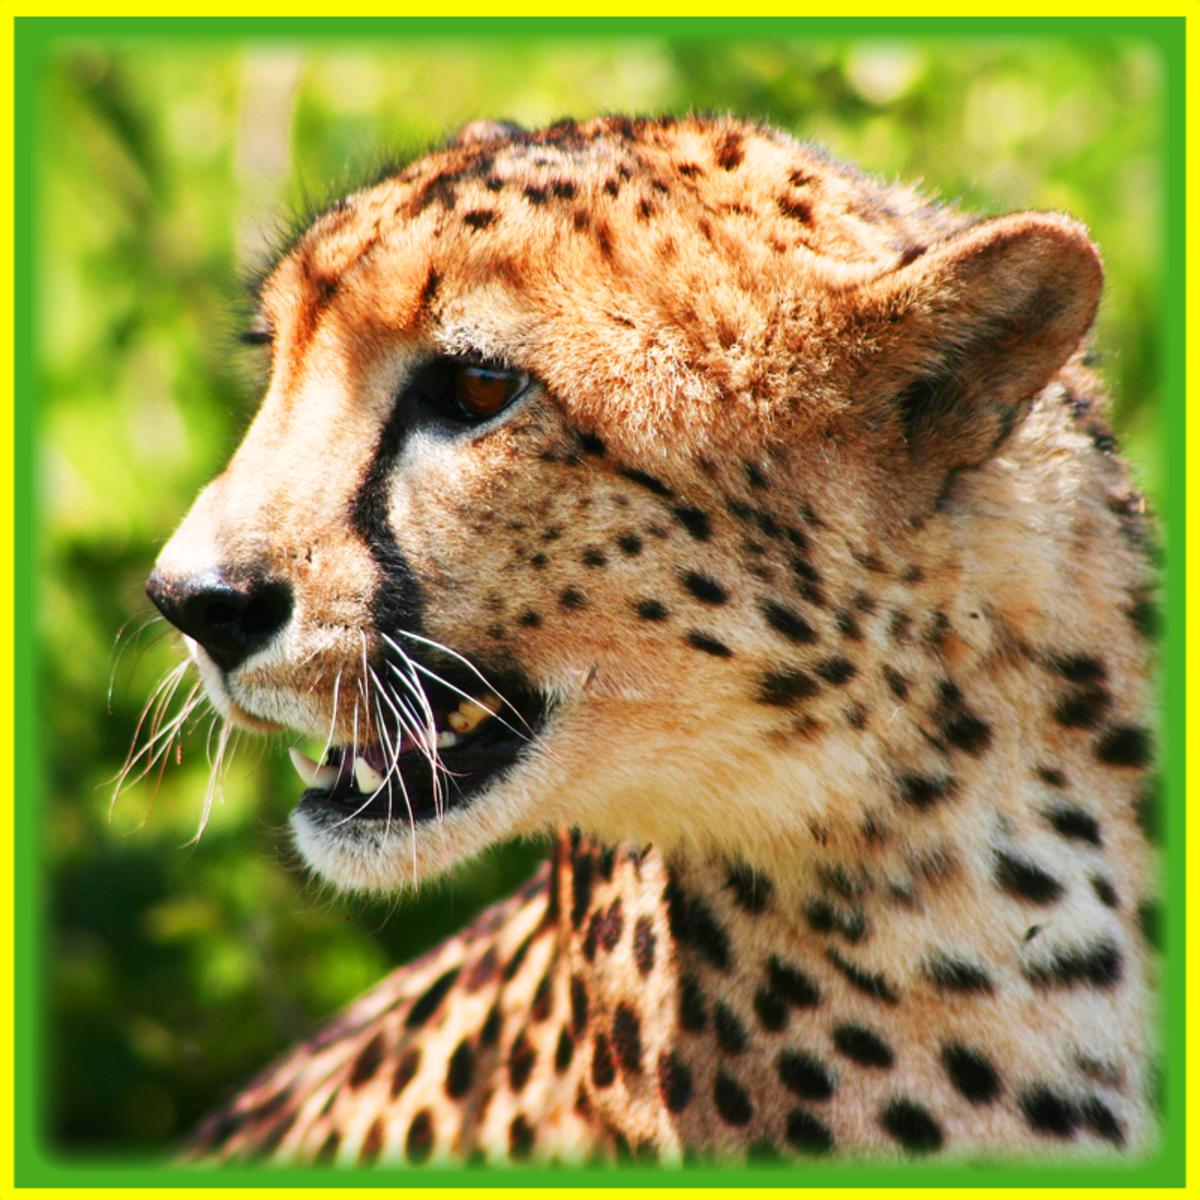 relative-top-speeds-of-common-land-animals